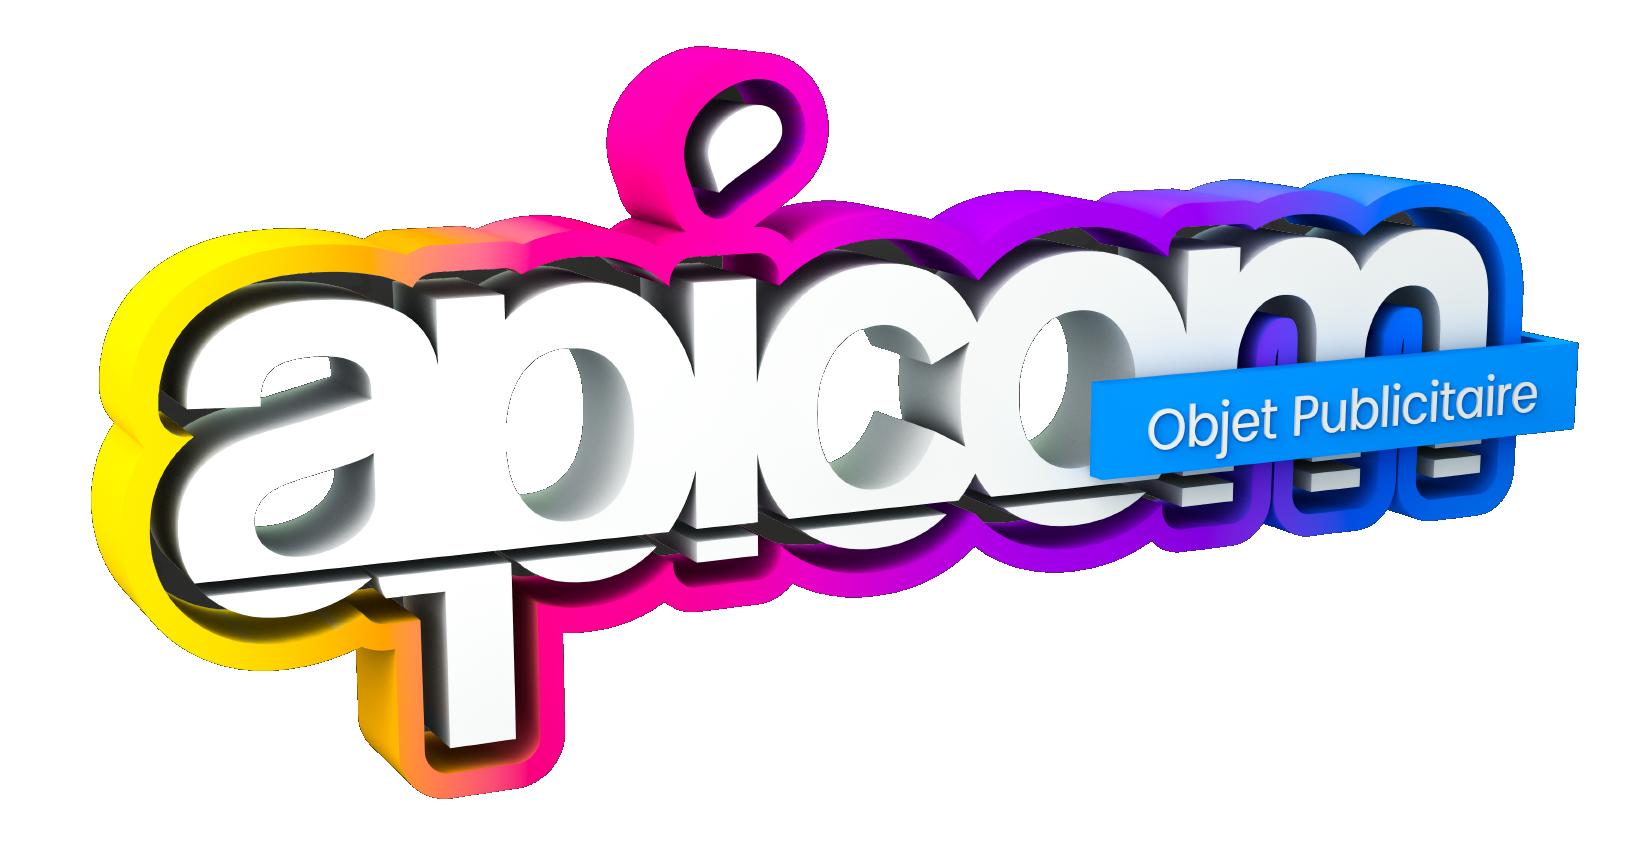 Apicom-Objet